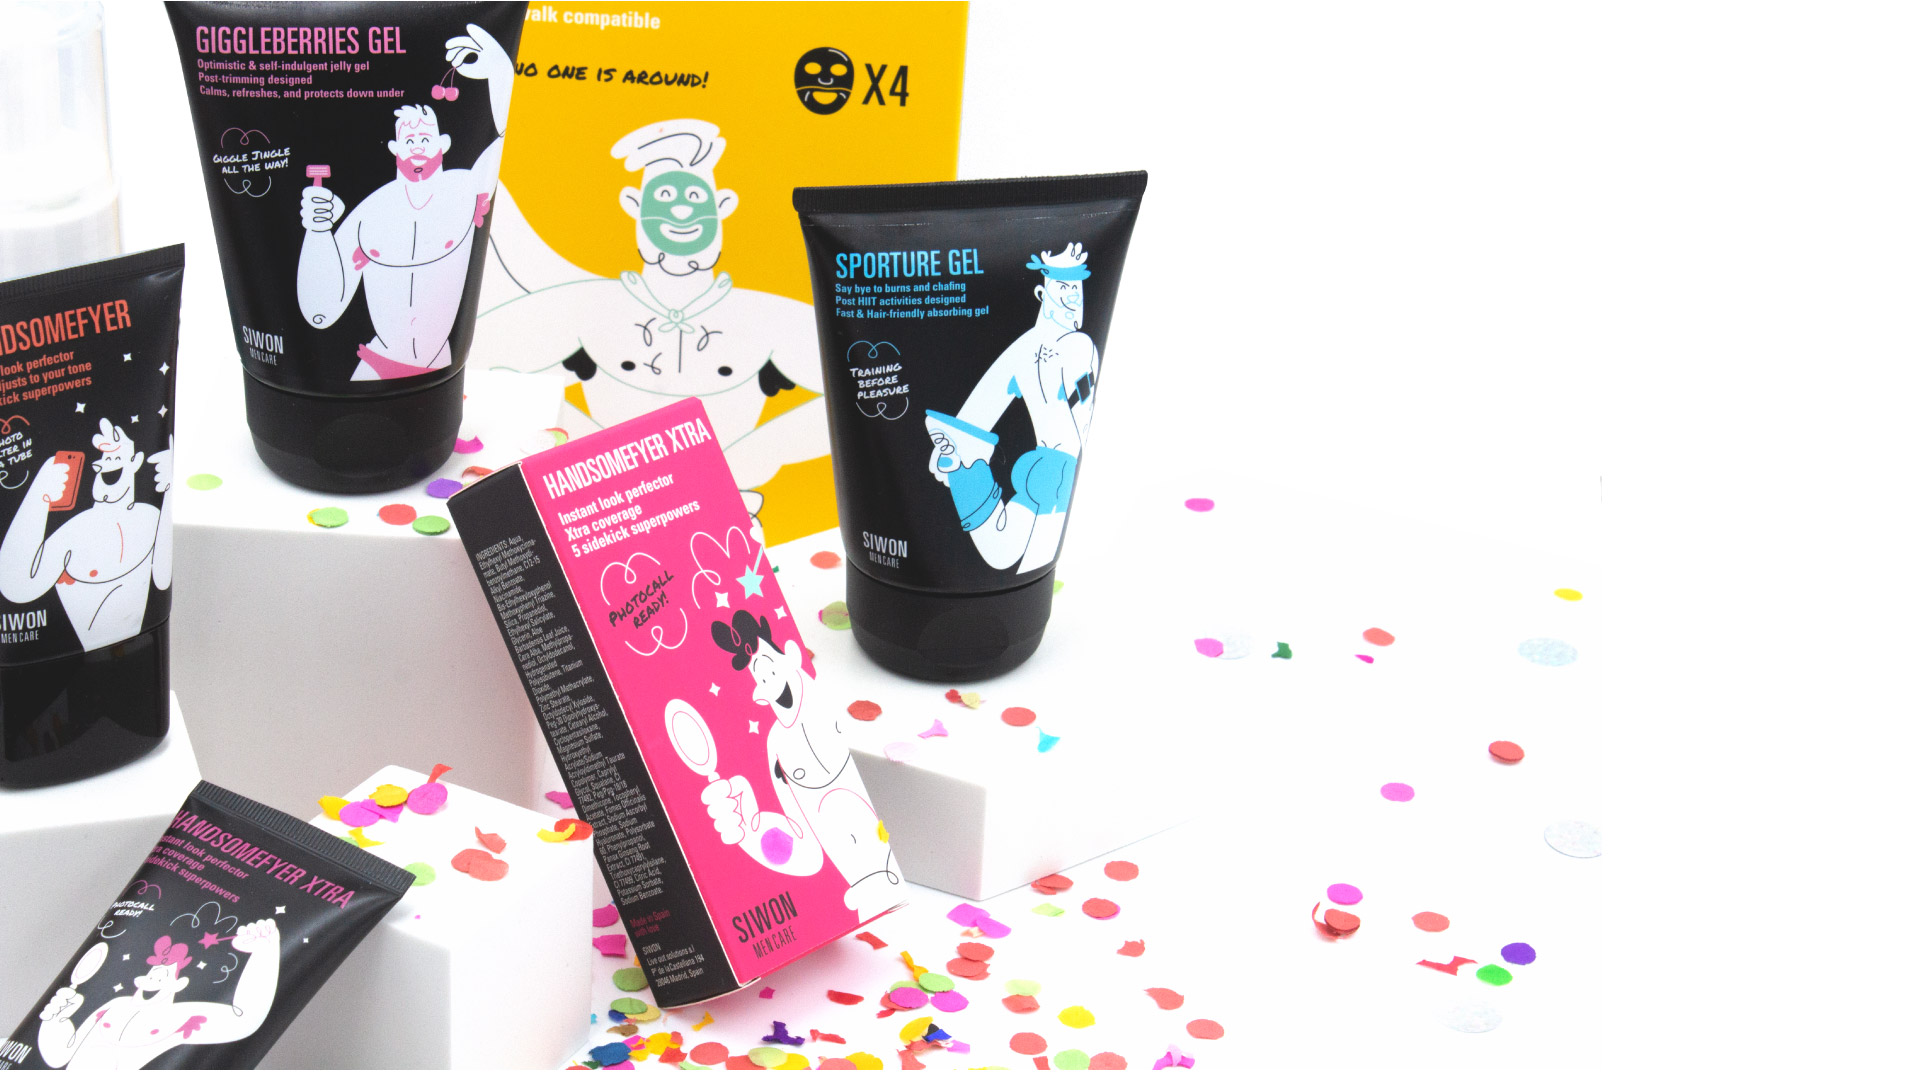 Siwon Men Care Product Range Illustration and Packaging Design